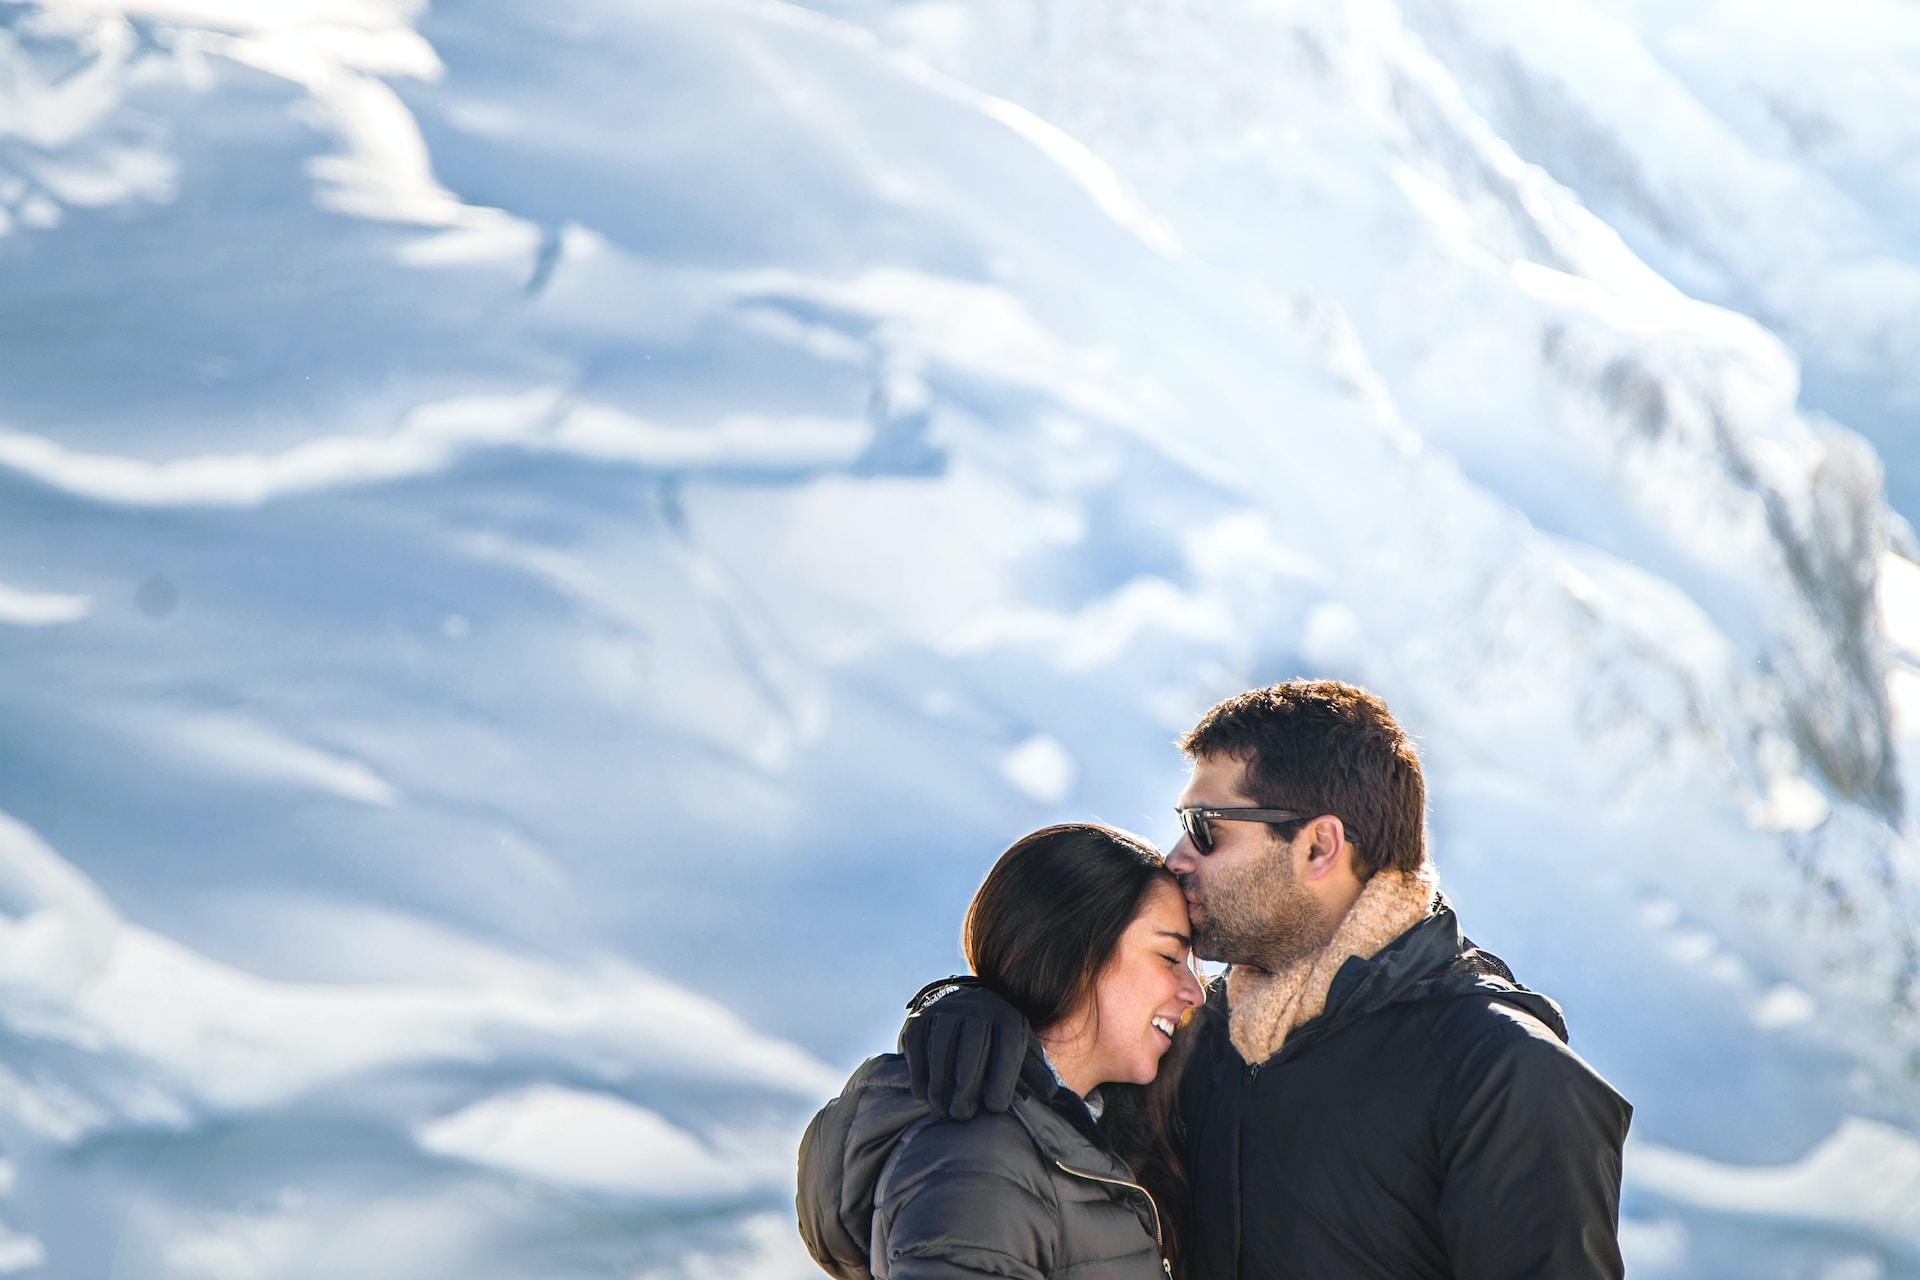 man kiss woman in forehead